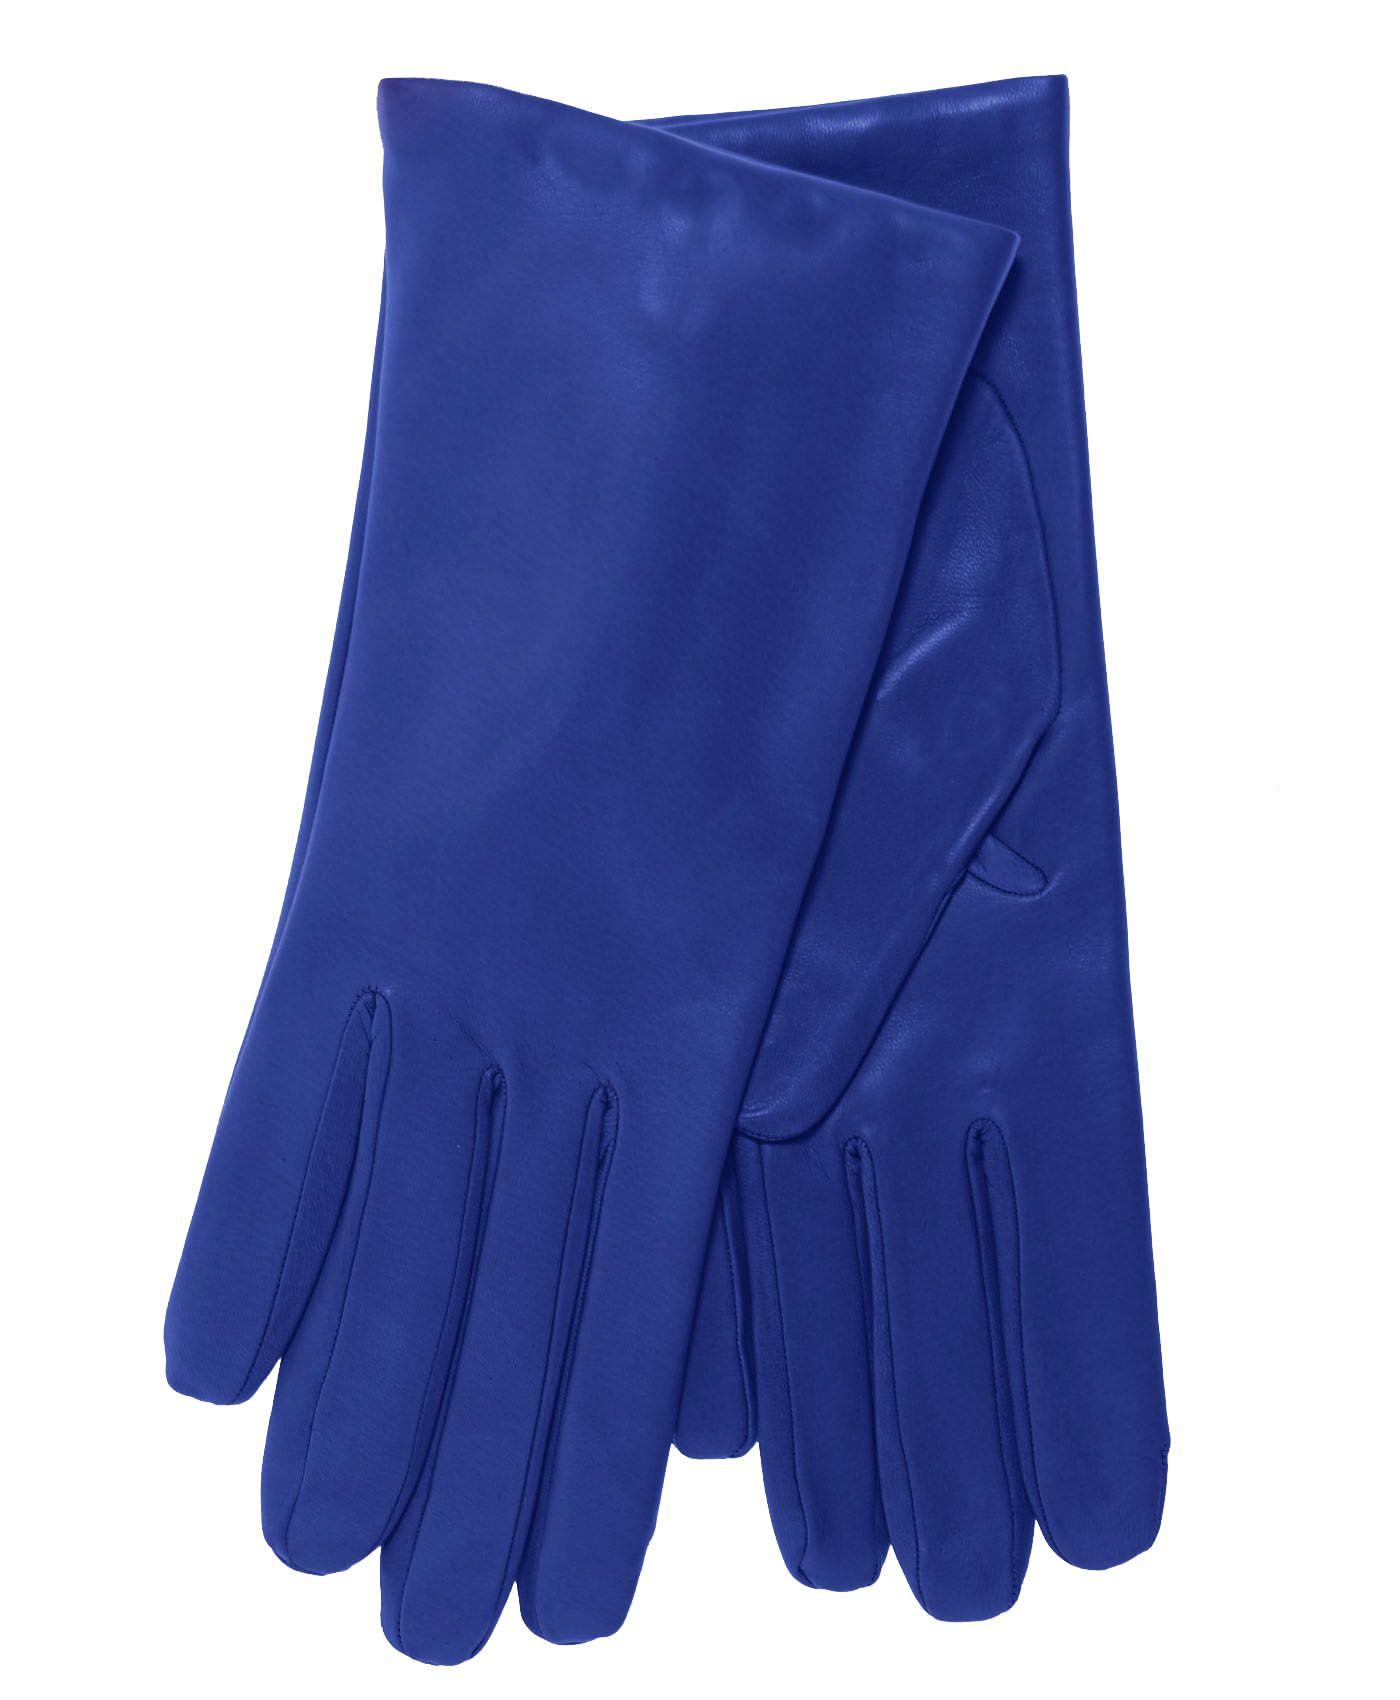 Women's Italian Cashmere Lined Lambskin Leather Gloves Blue